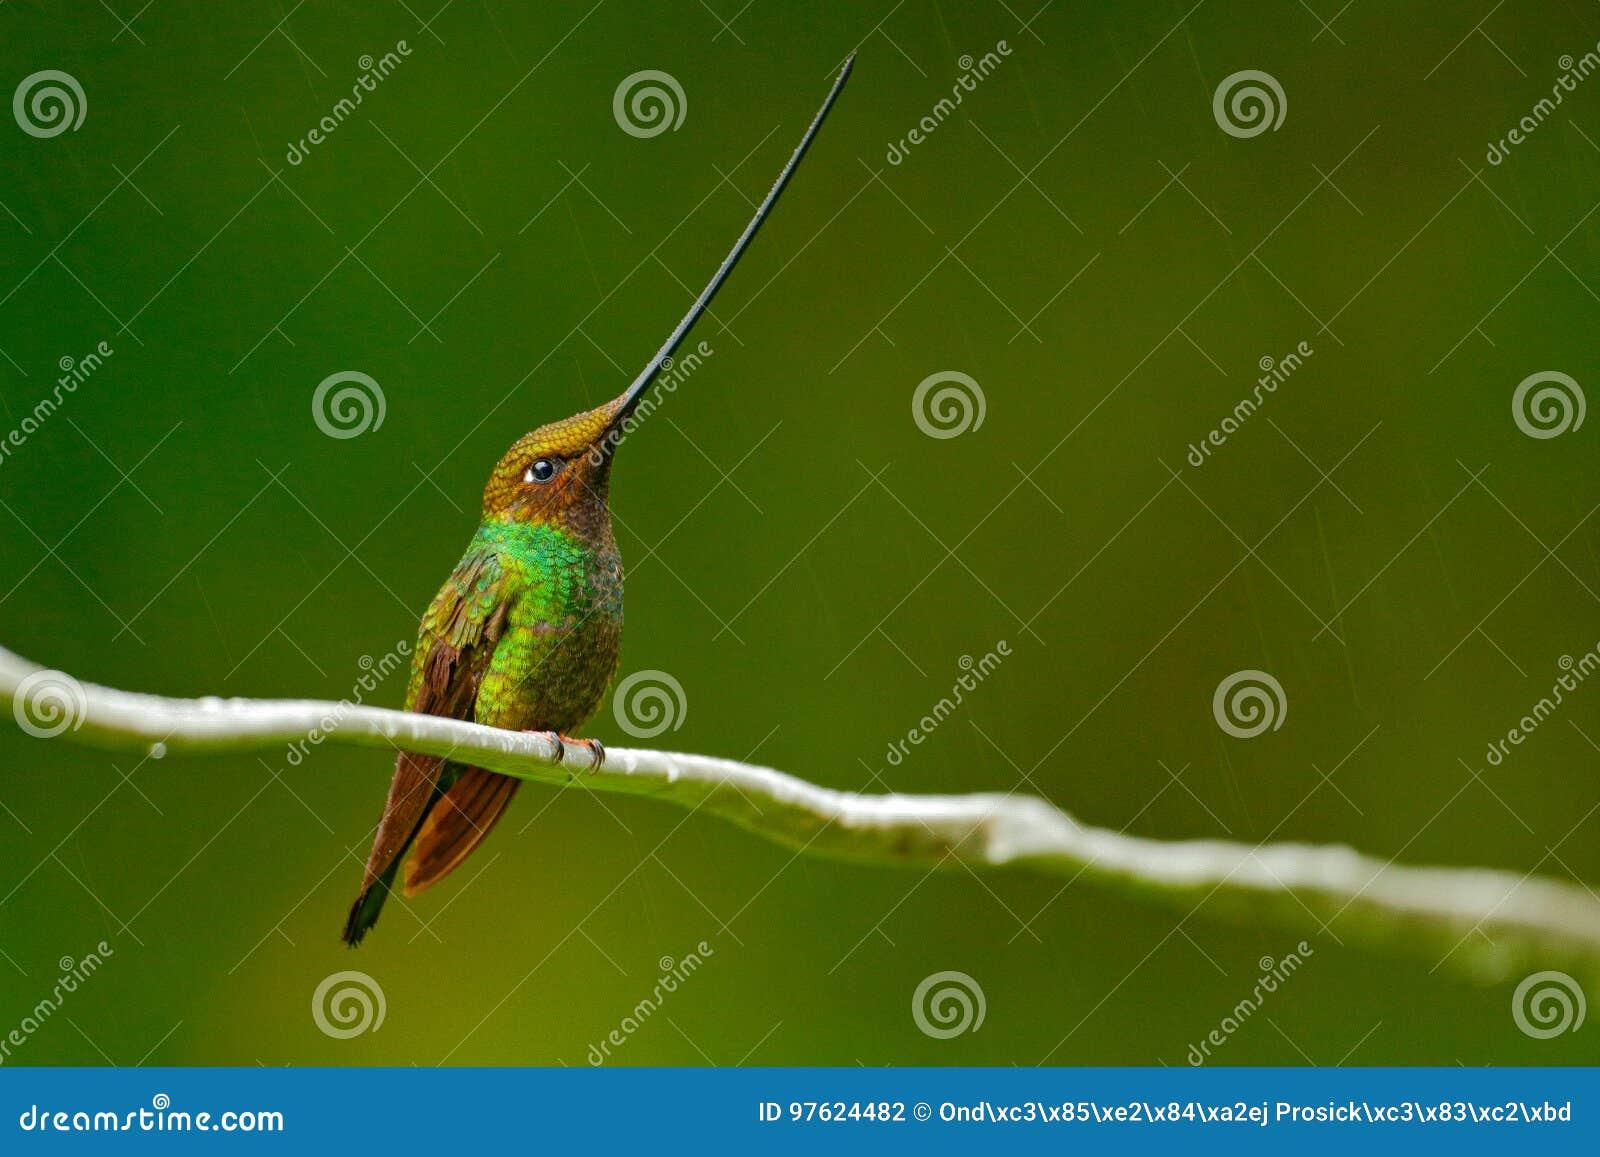 Bird with longest beak. Sword-billed hummingbird, Ensifera ensifera, bird with unbelievable longest bill, nature forest habitat, E